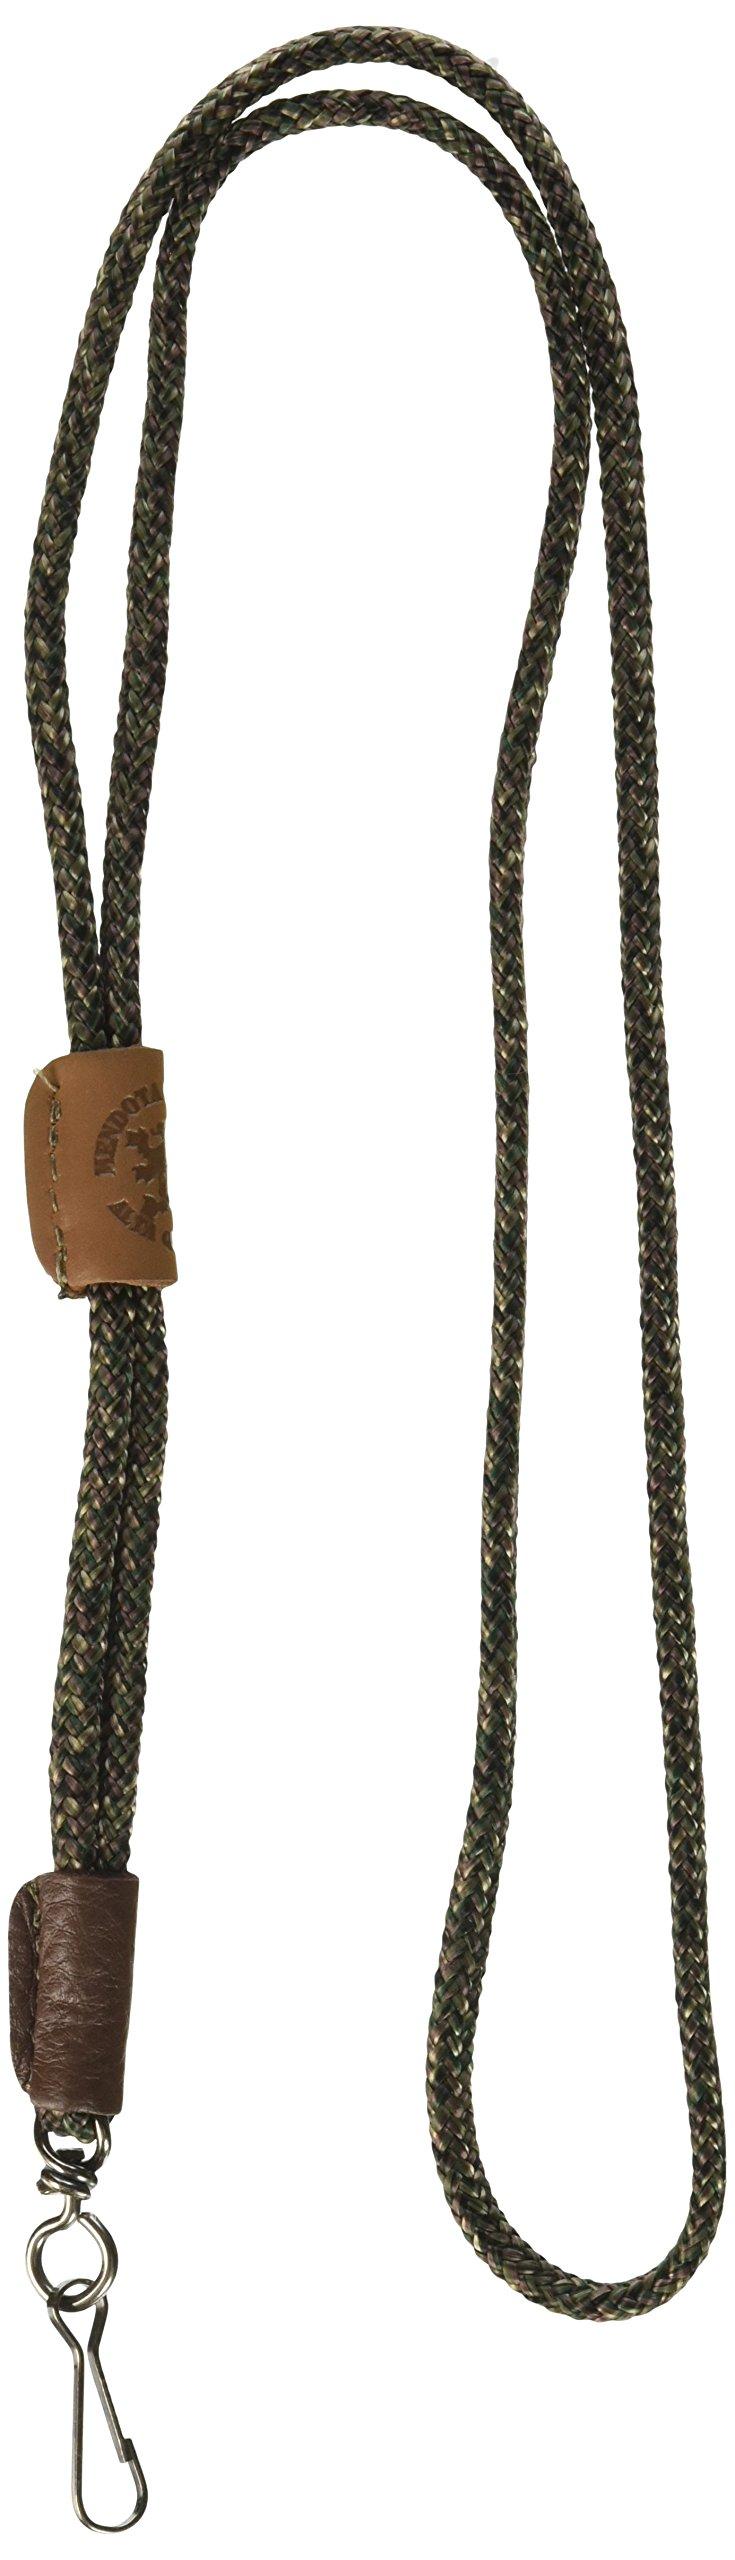 Mendota Pet Single Lanyard Whistle, 1/8 by 25-Inch, Camo